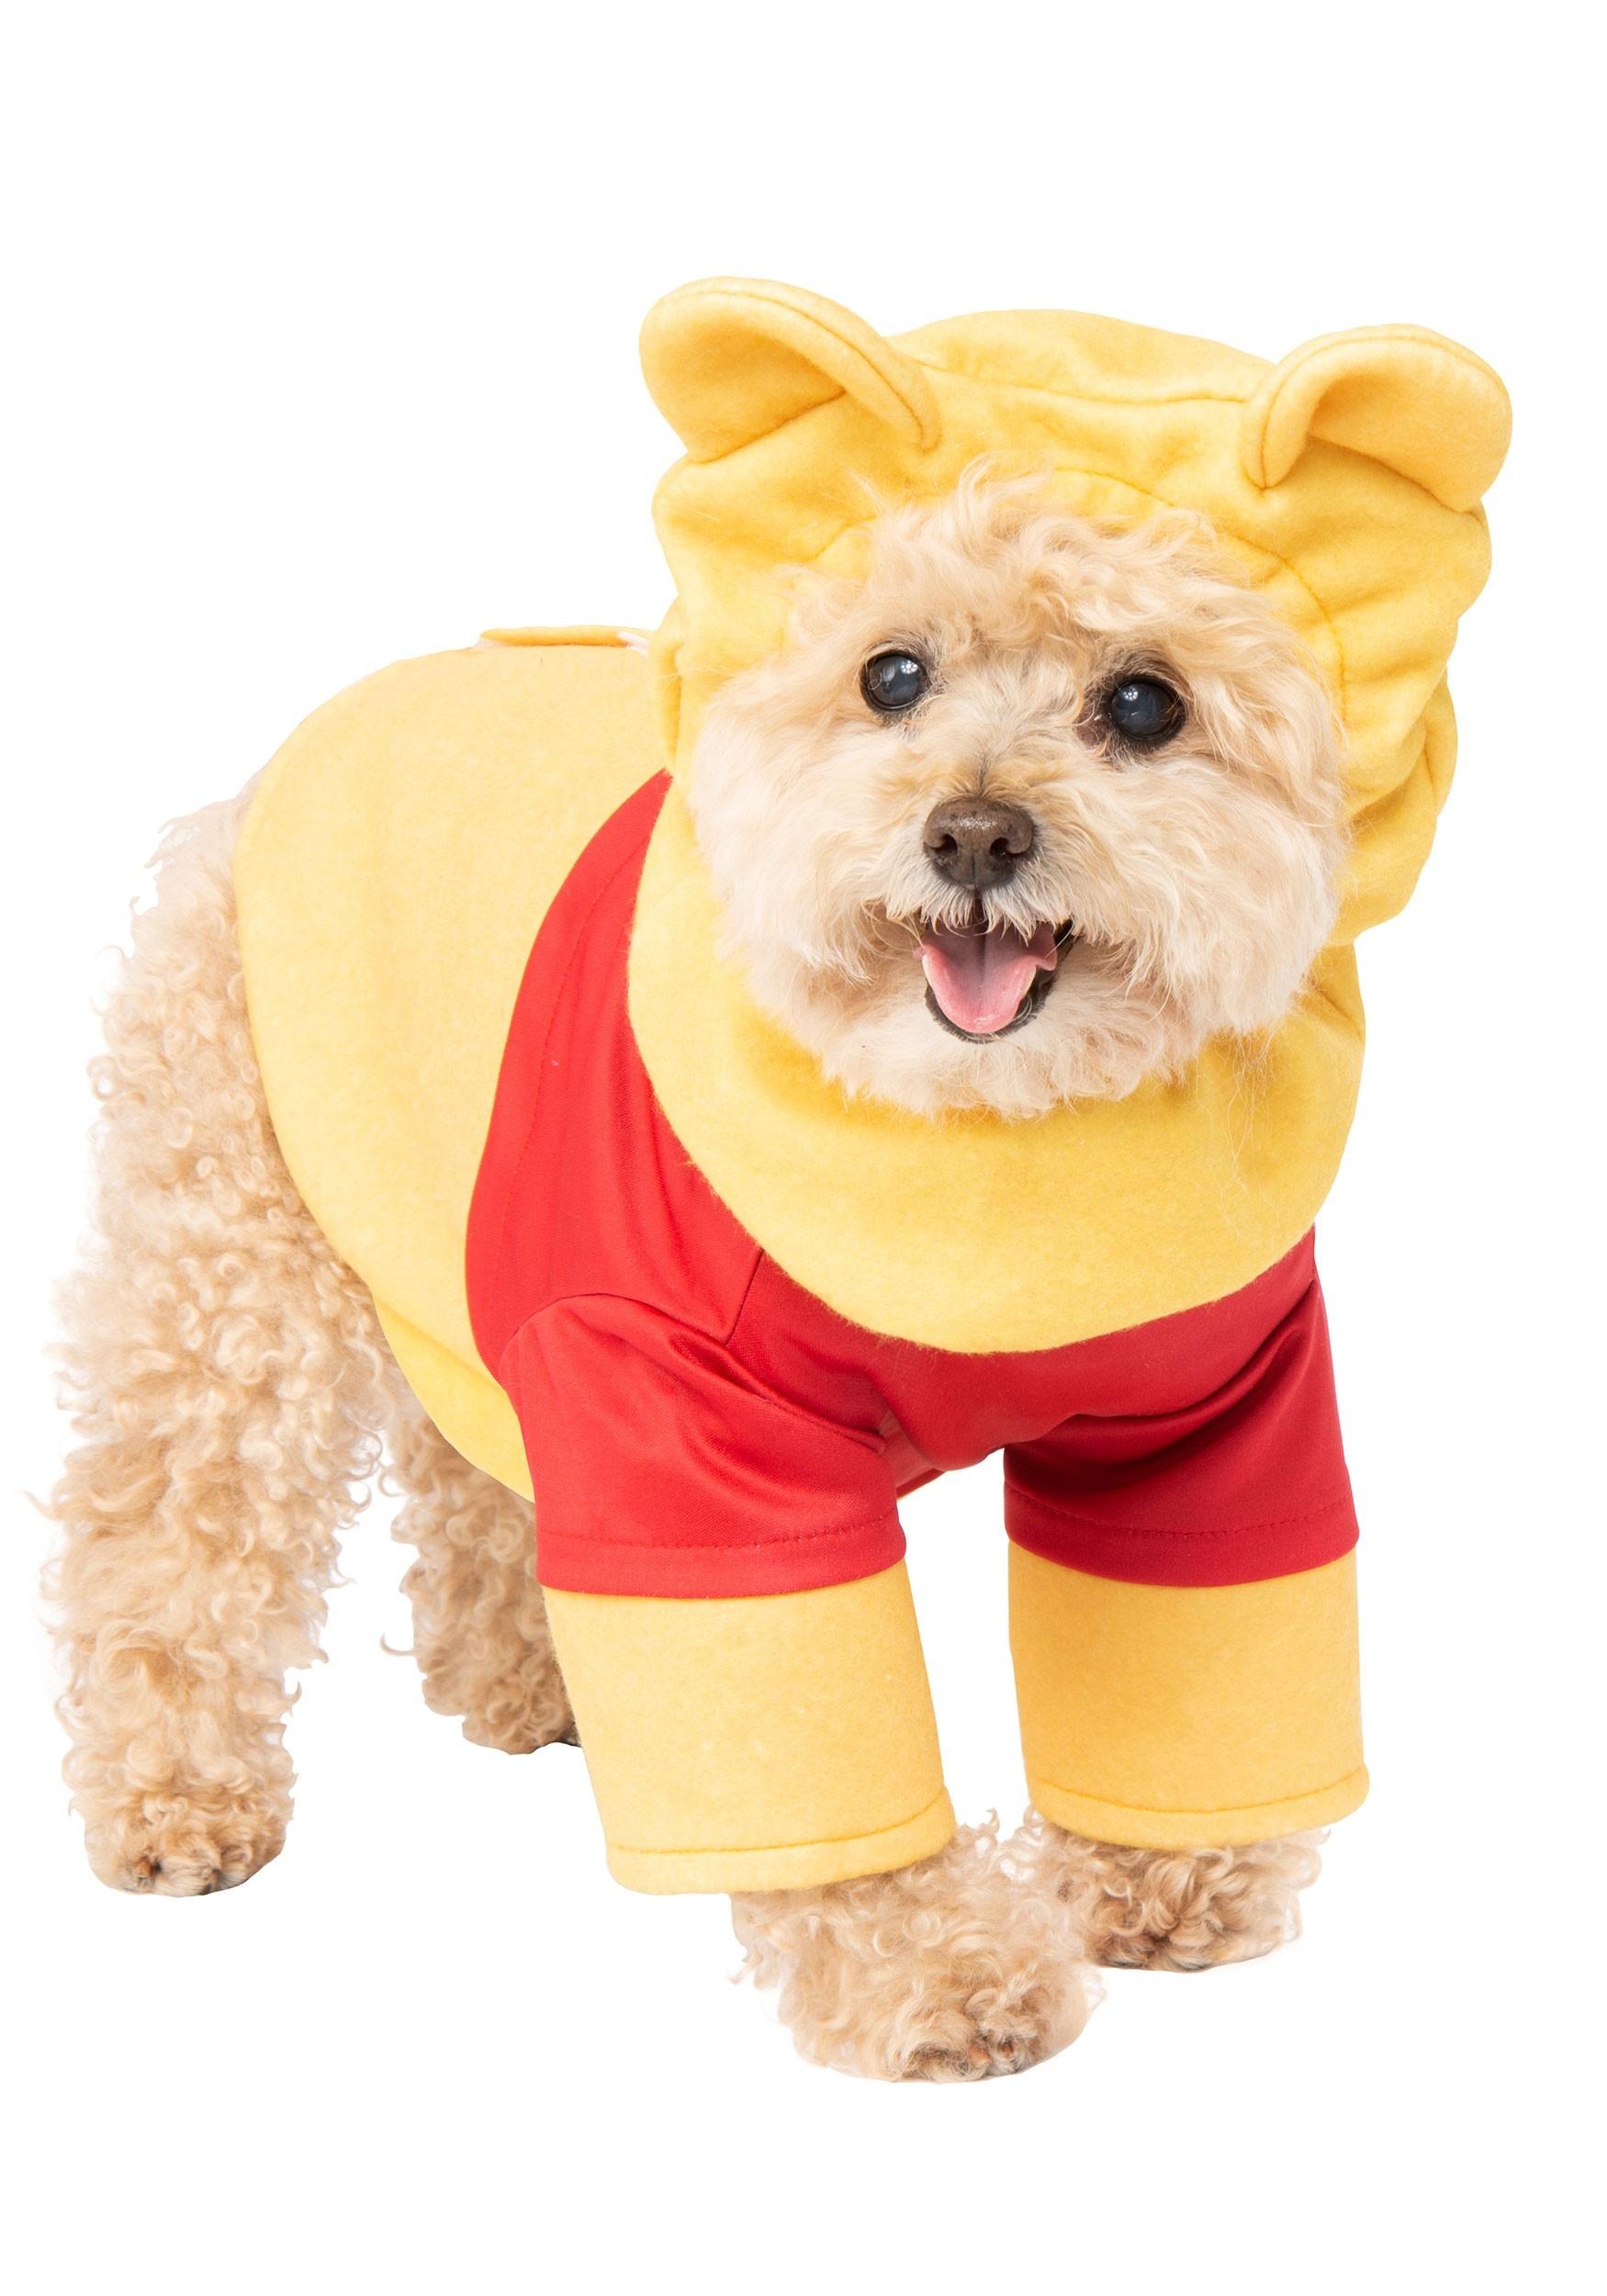 Winnie the Pooh Pet Costume Dog